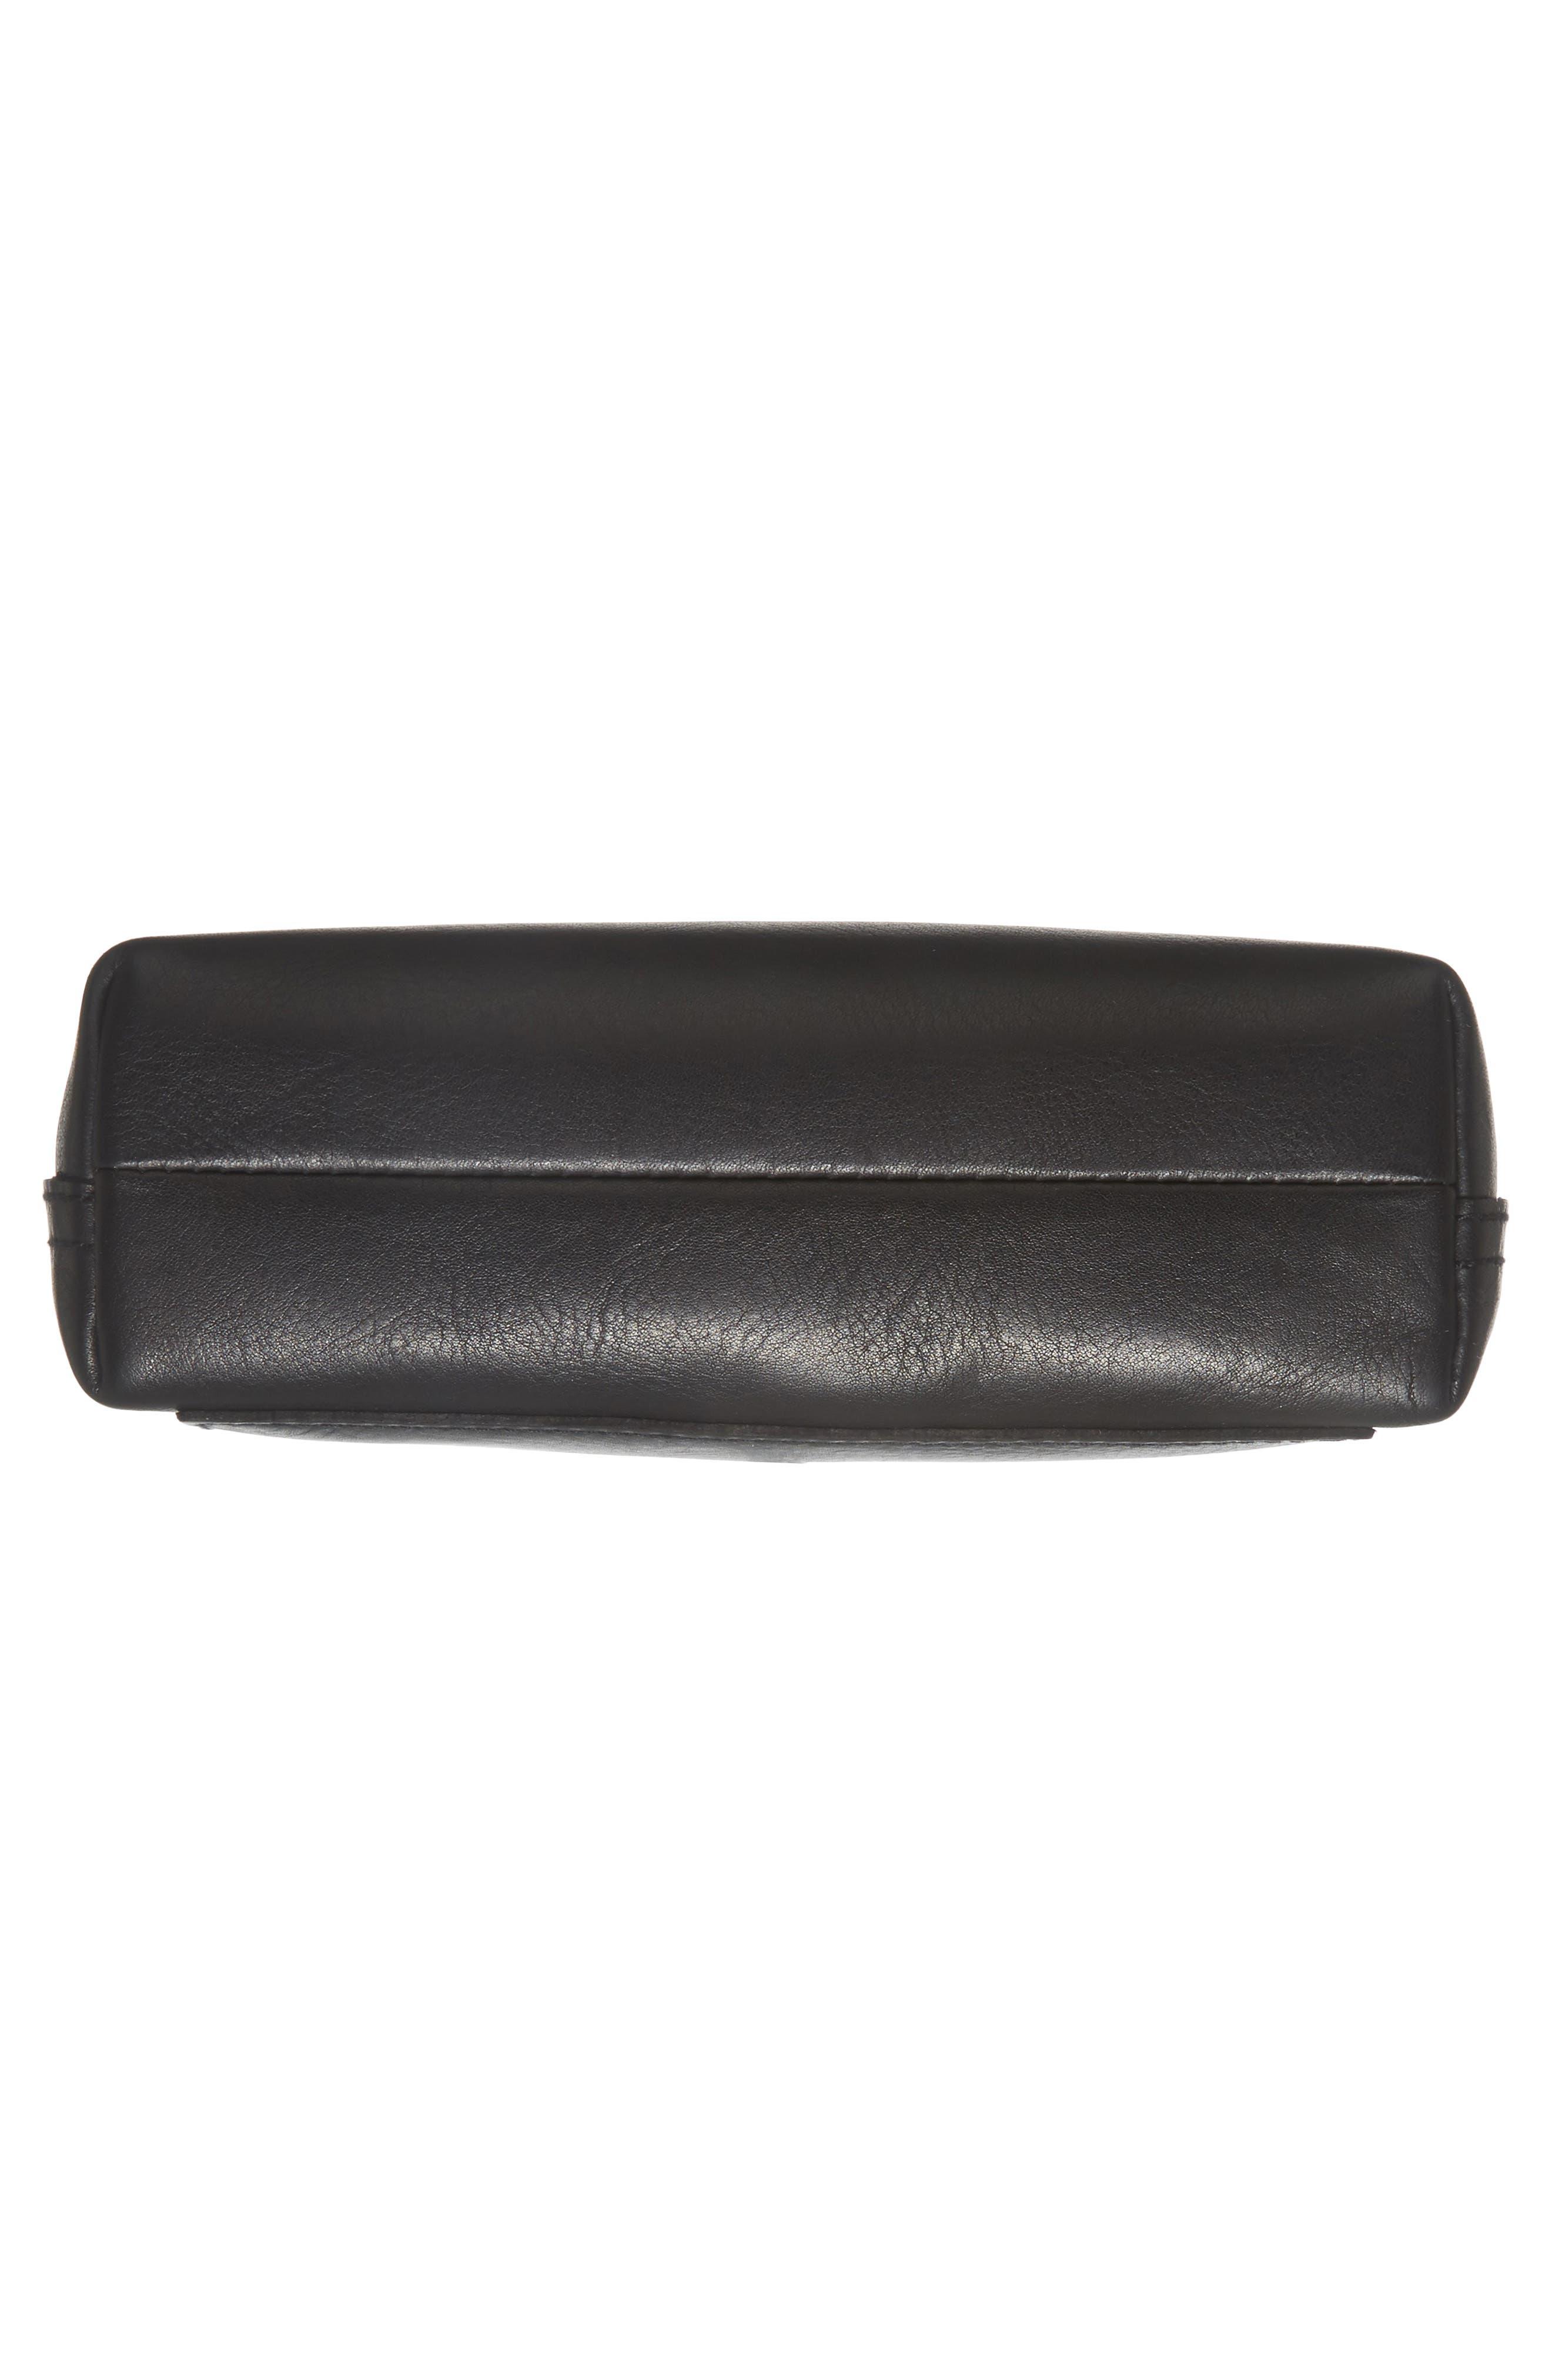 Small Transport Leather Crossbody,                             Alternate thumbnail 6, color,                             TRUE BLACK